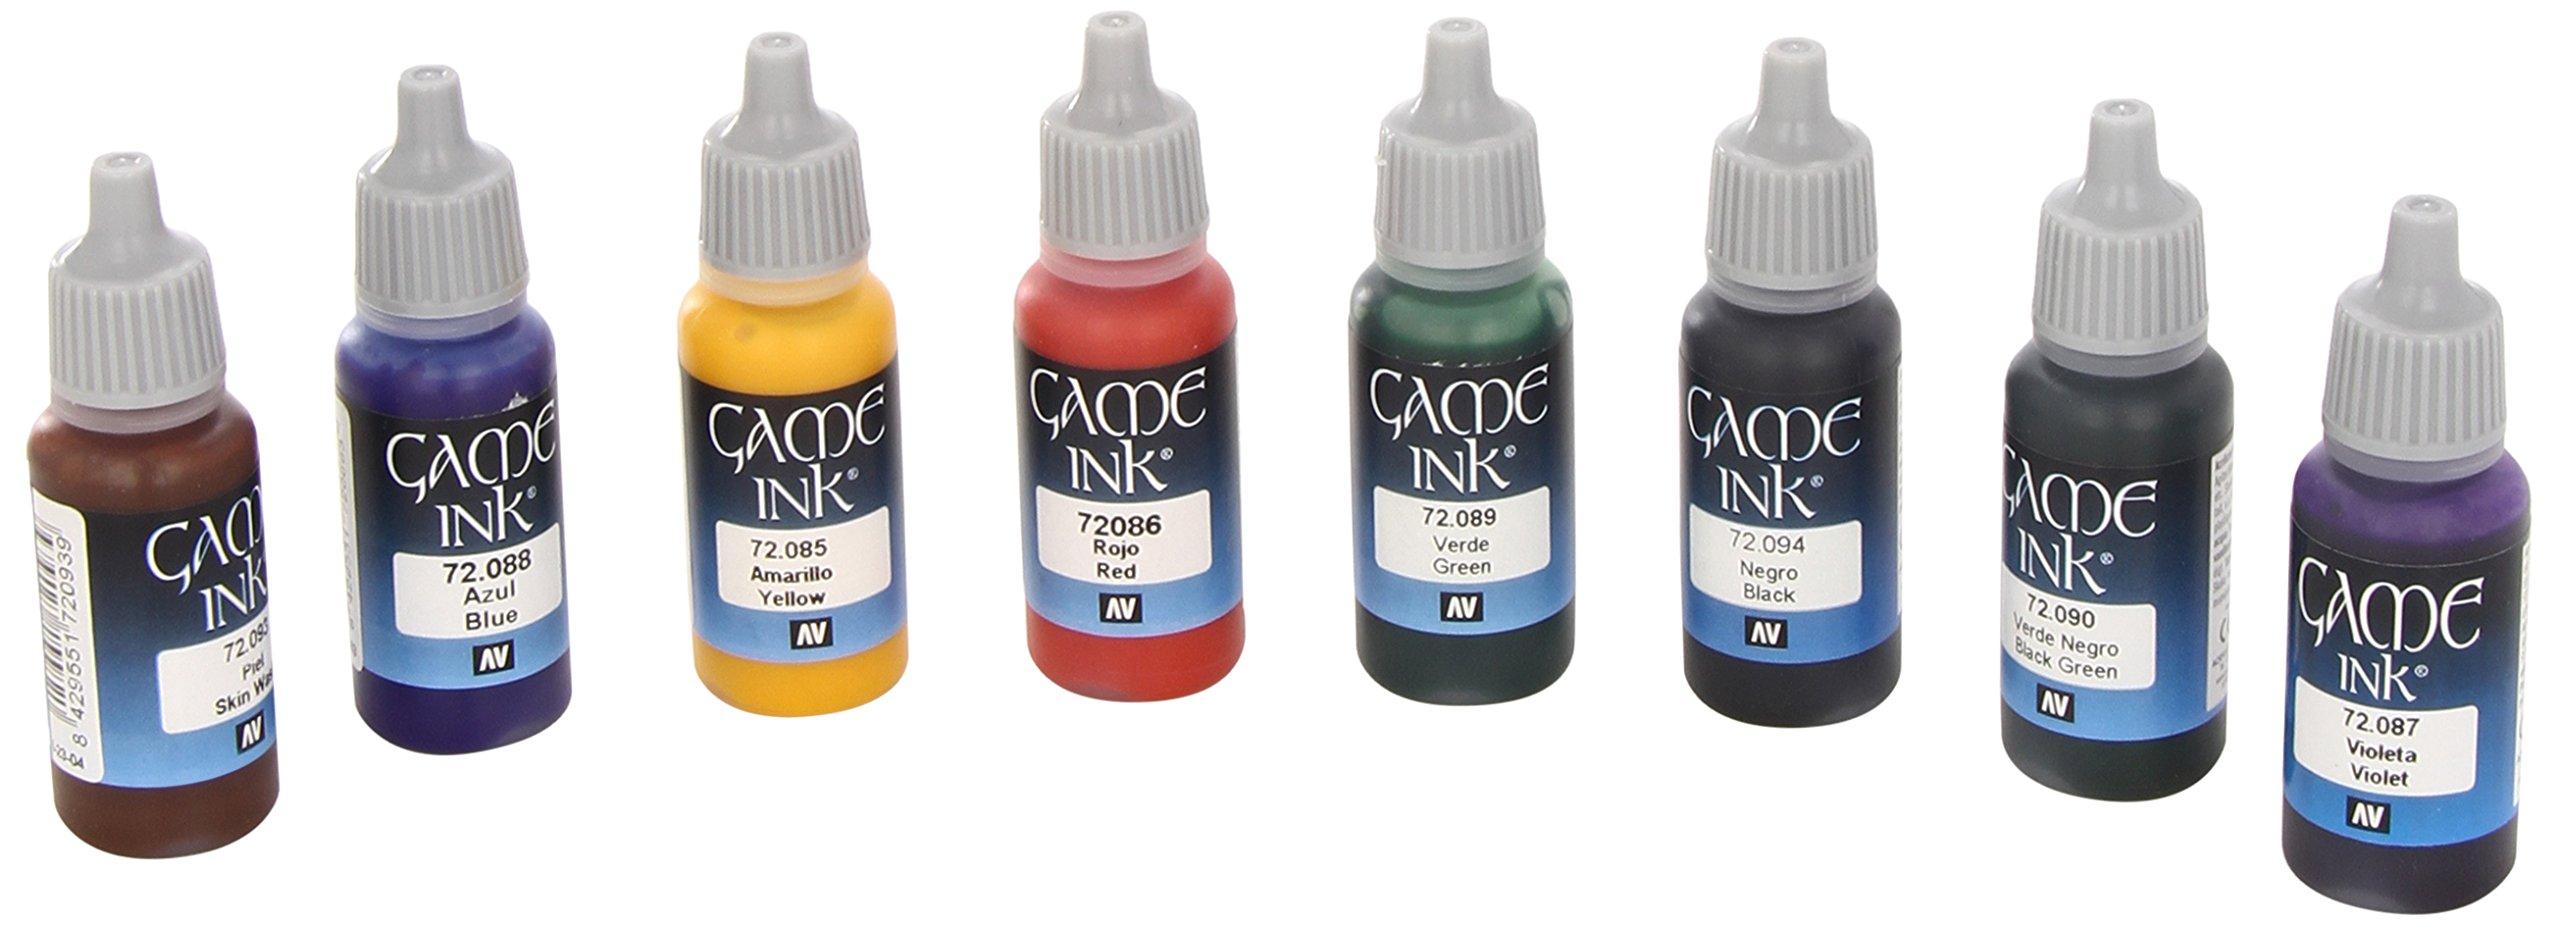 Vallejo Game Ink Paint Set (8 Color) Paint